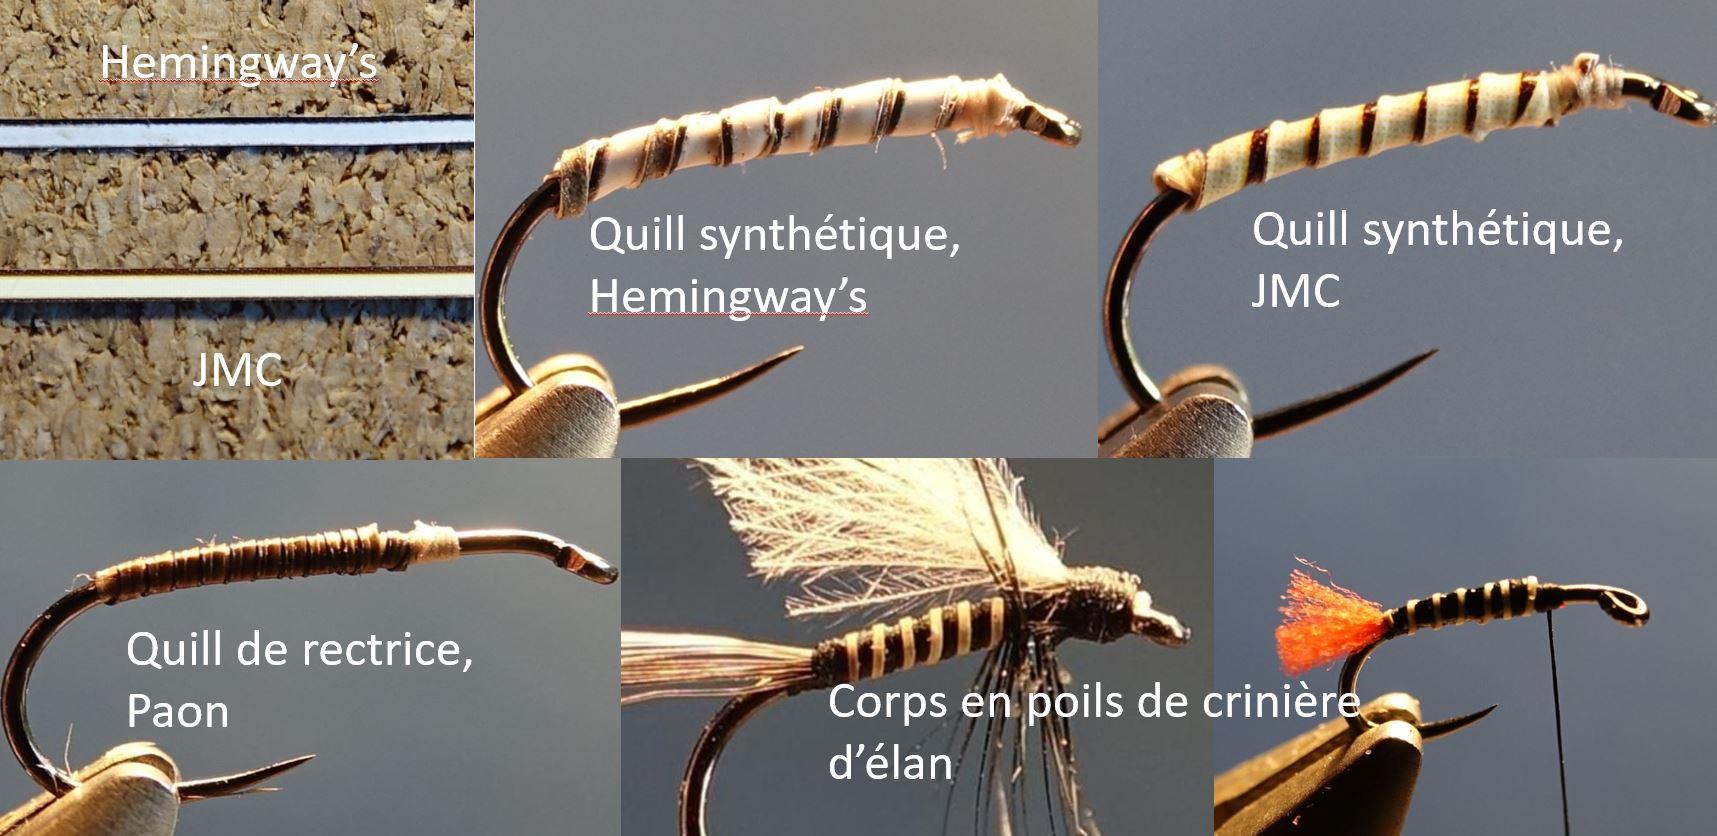 quill naturel synthetique poil crinière d'élan mouche fly tying eclosion